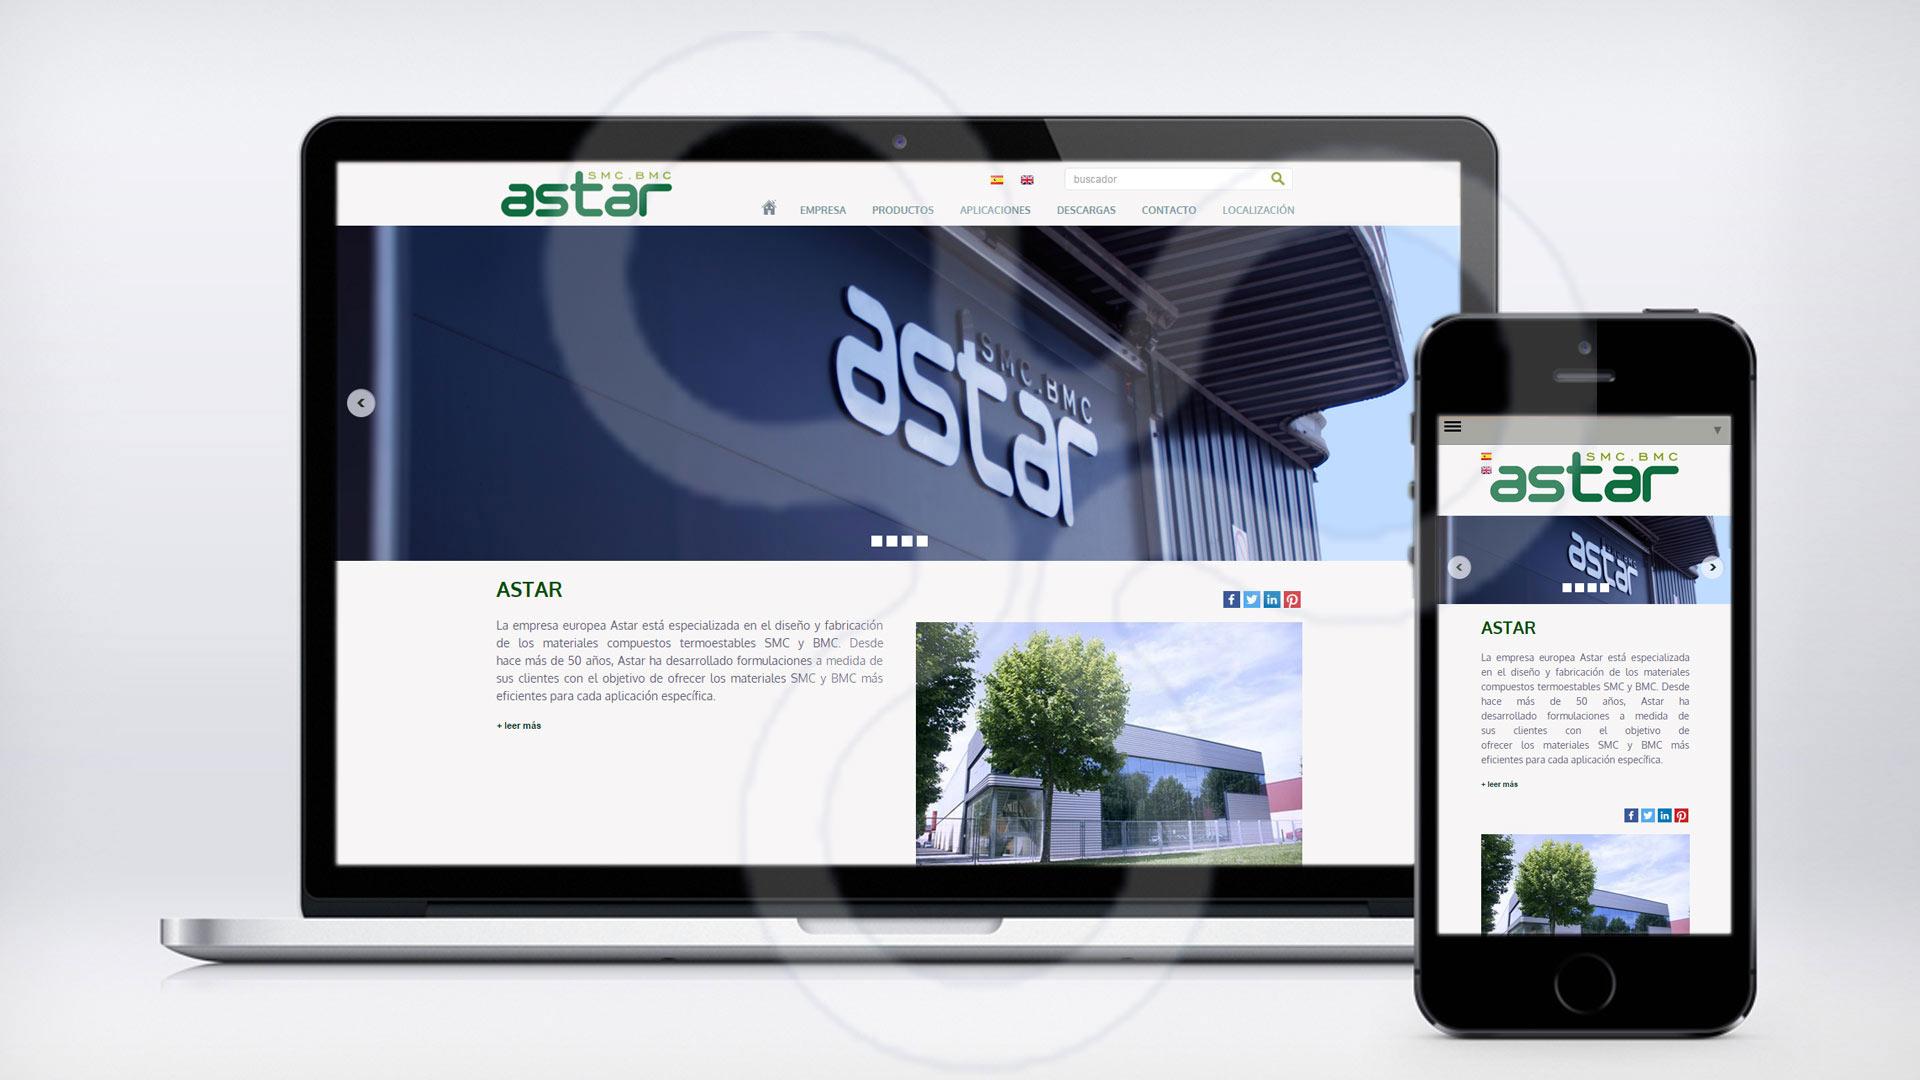 Imagen de la web de Astar